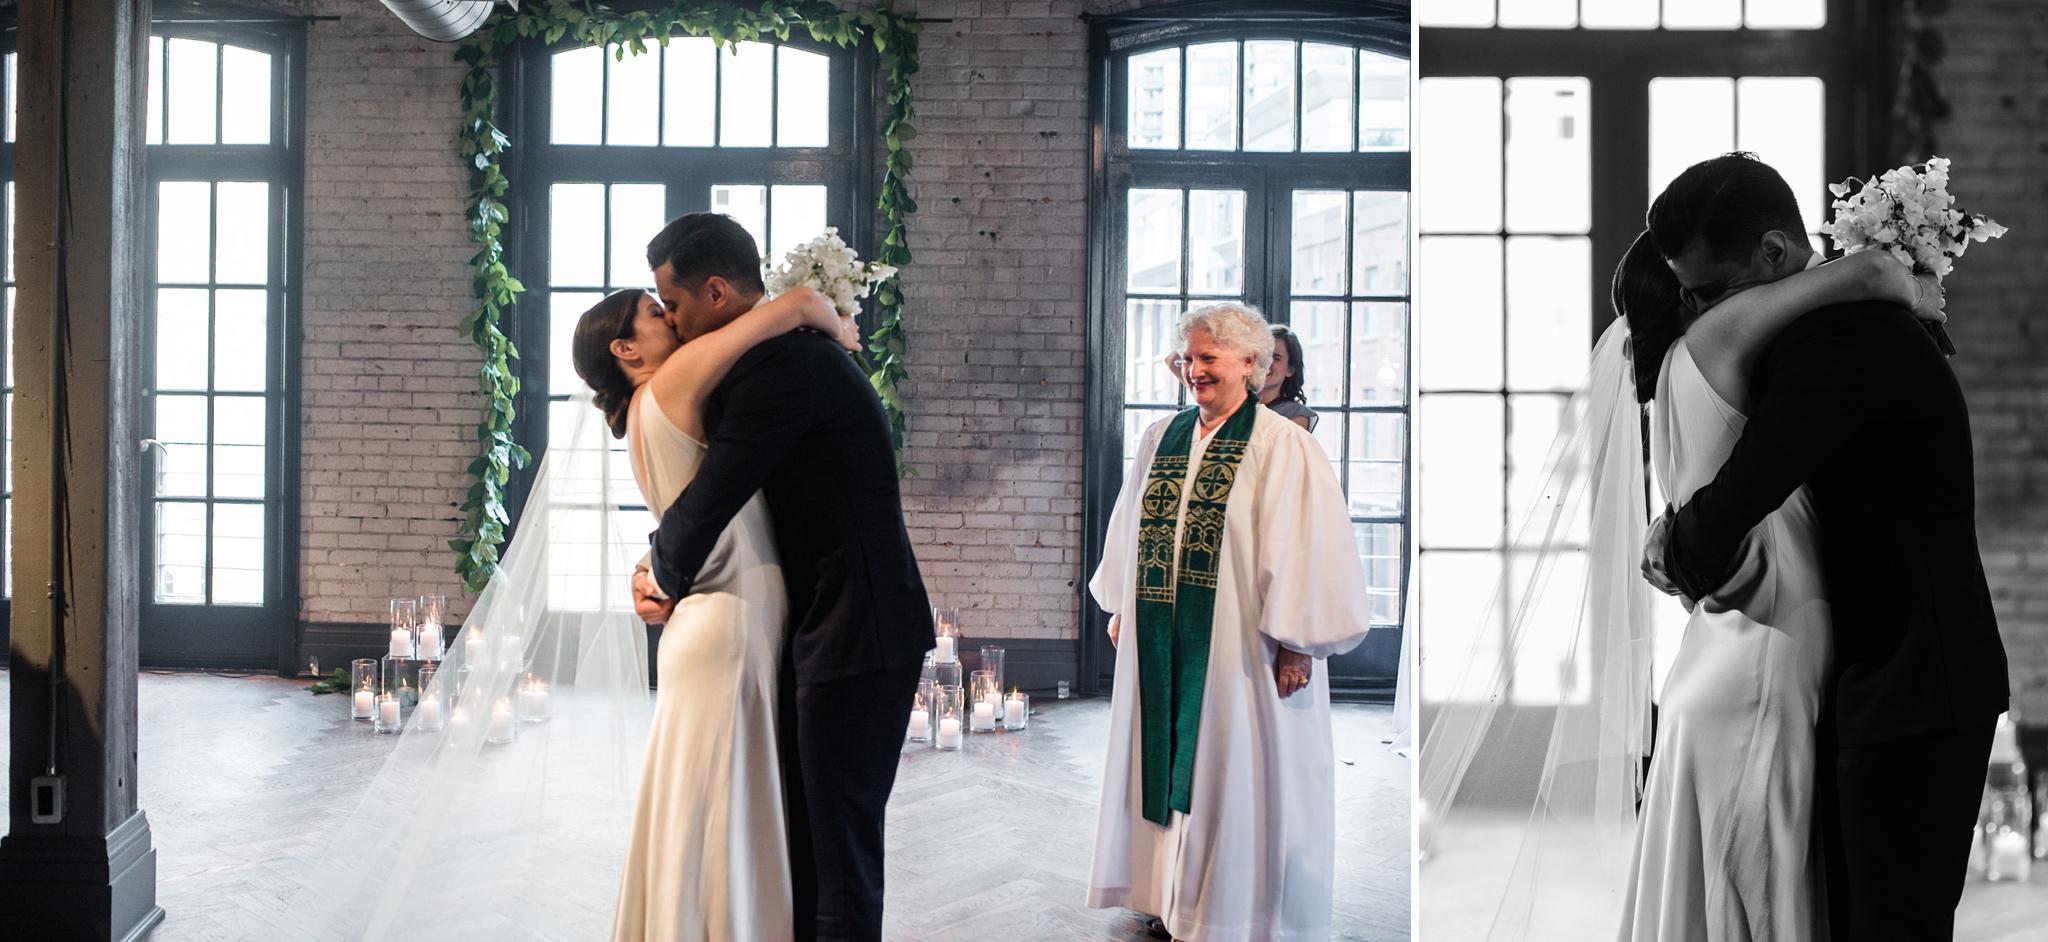 097-first-kiss-ceremony-wedding-storys-building-romantic.jpg